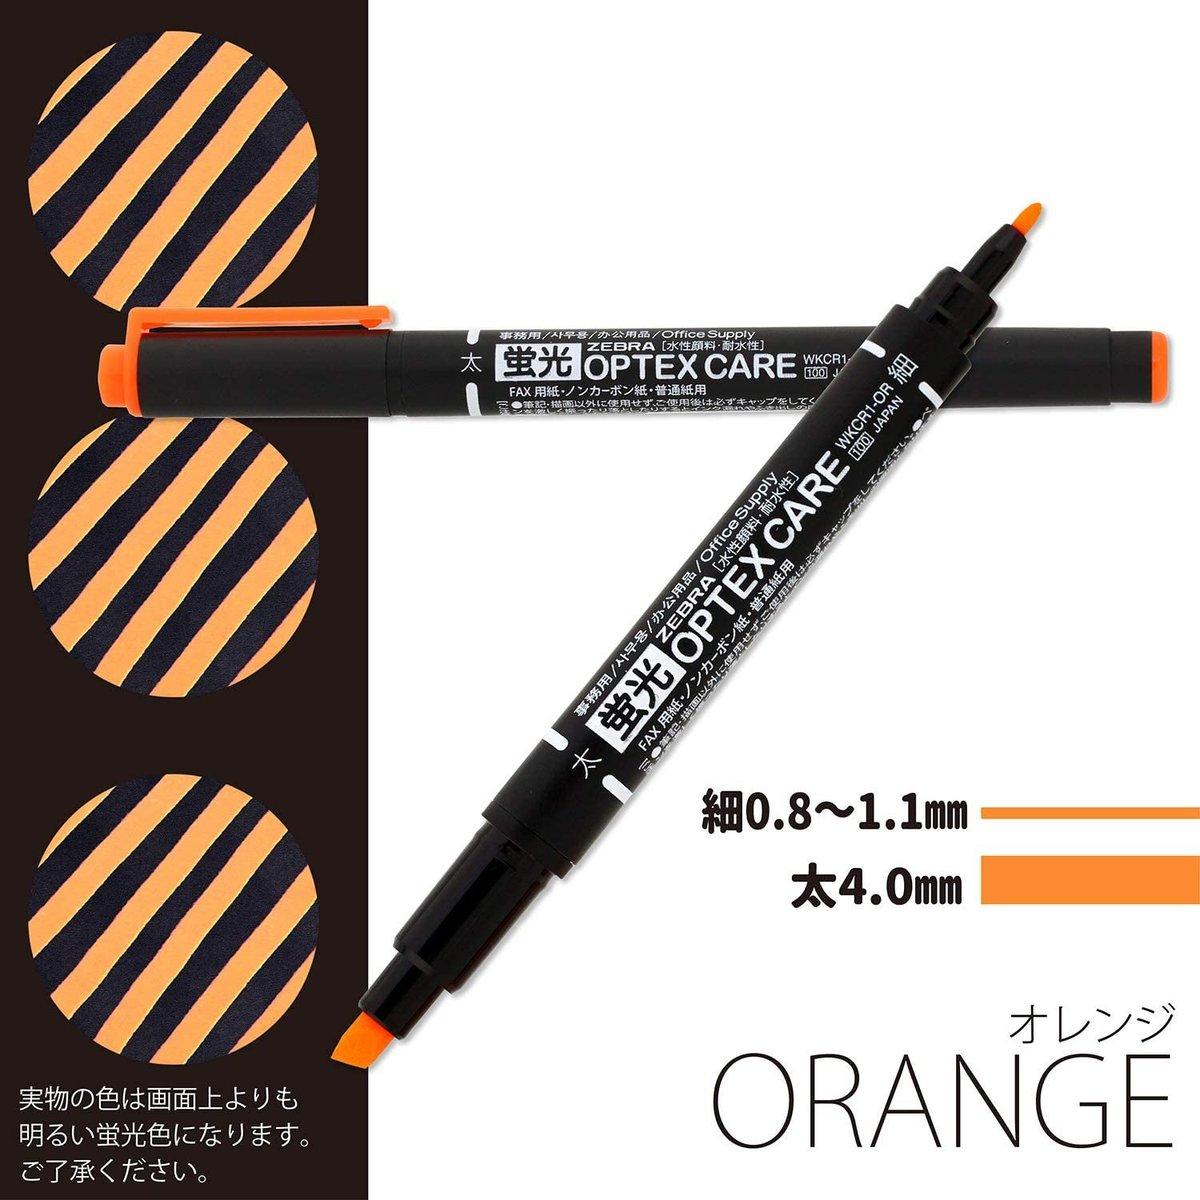 WKCR1-OR Optex Care 螢光筆[橙色] X 2支